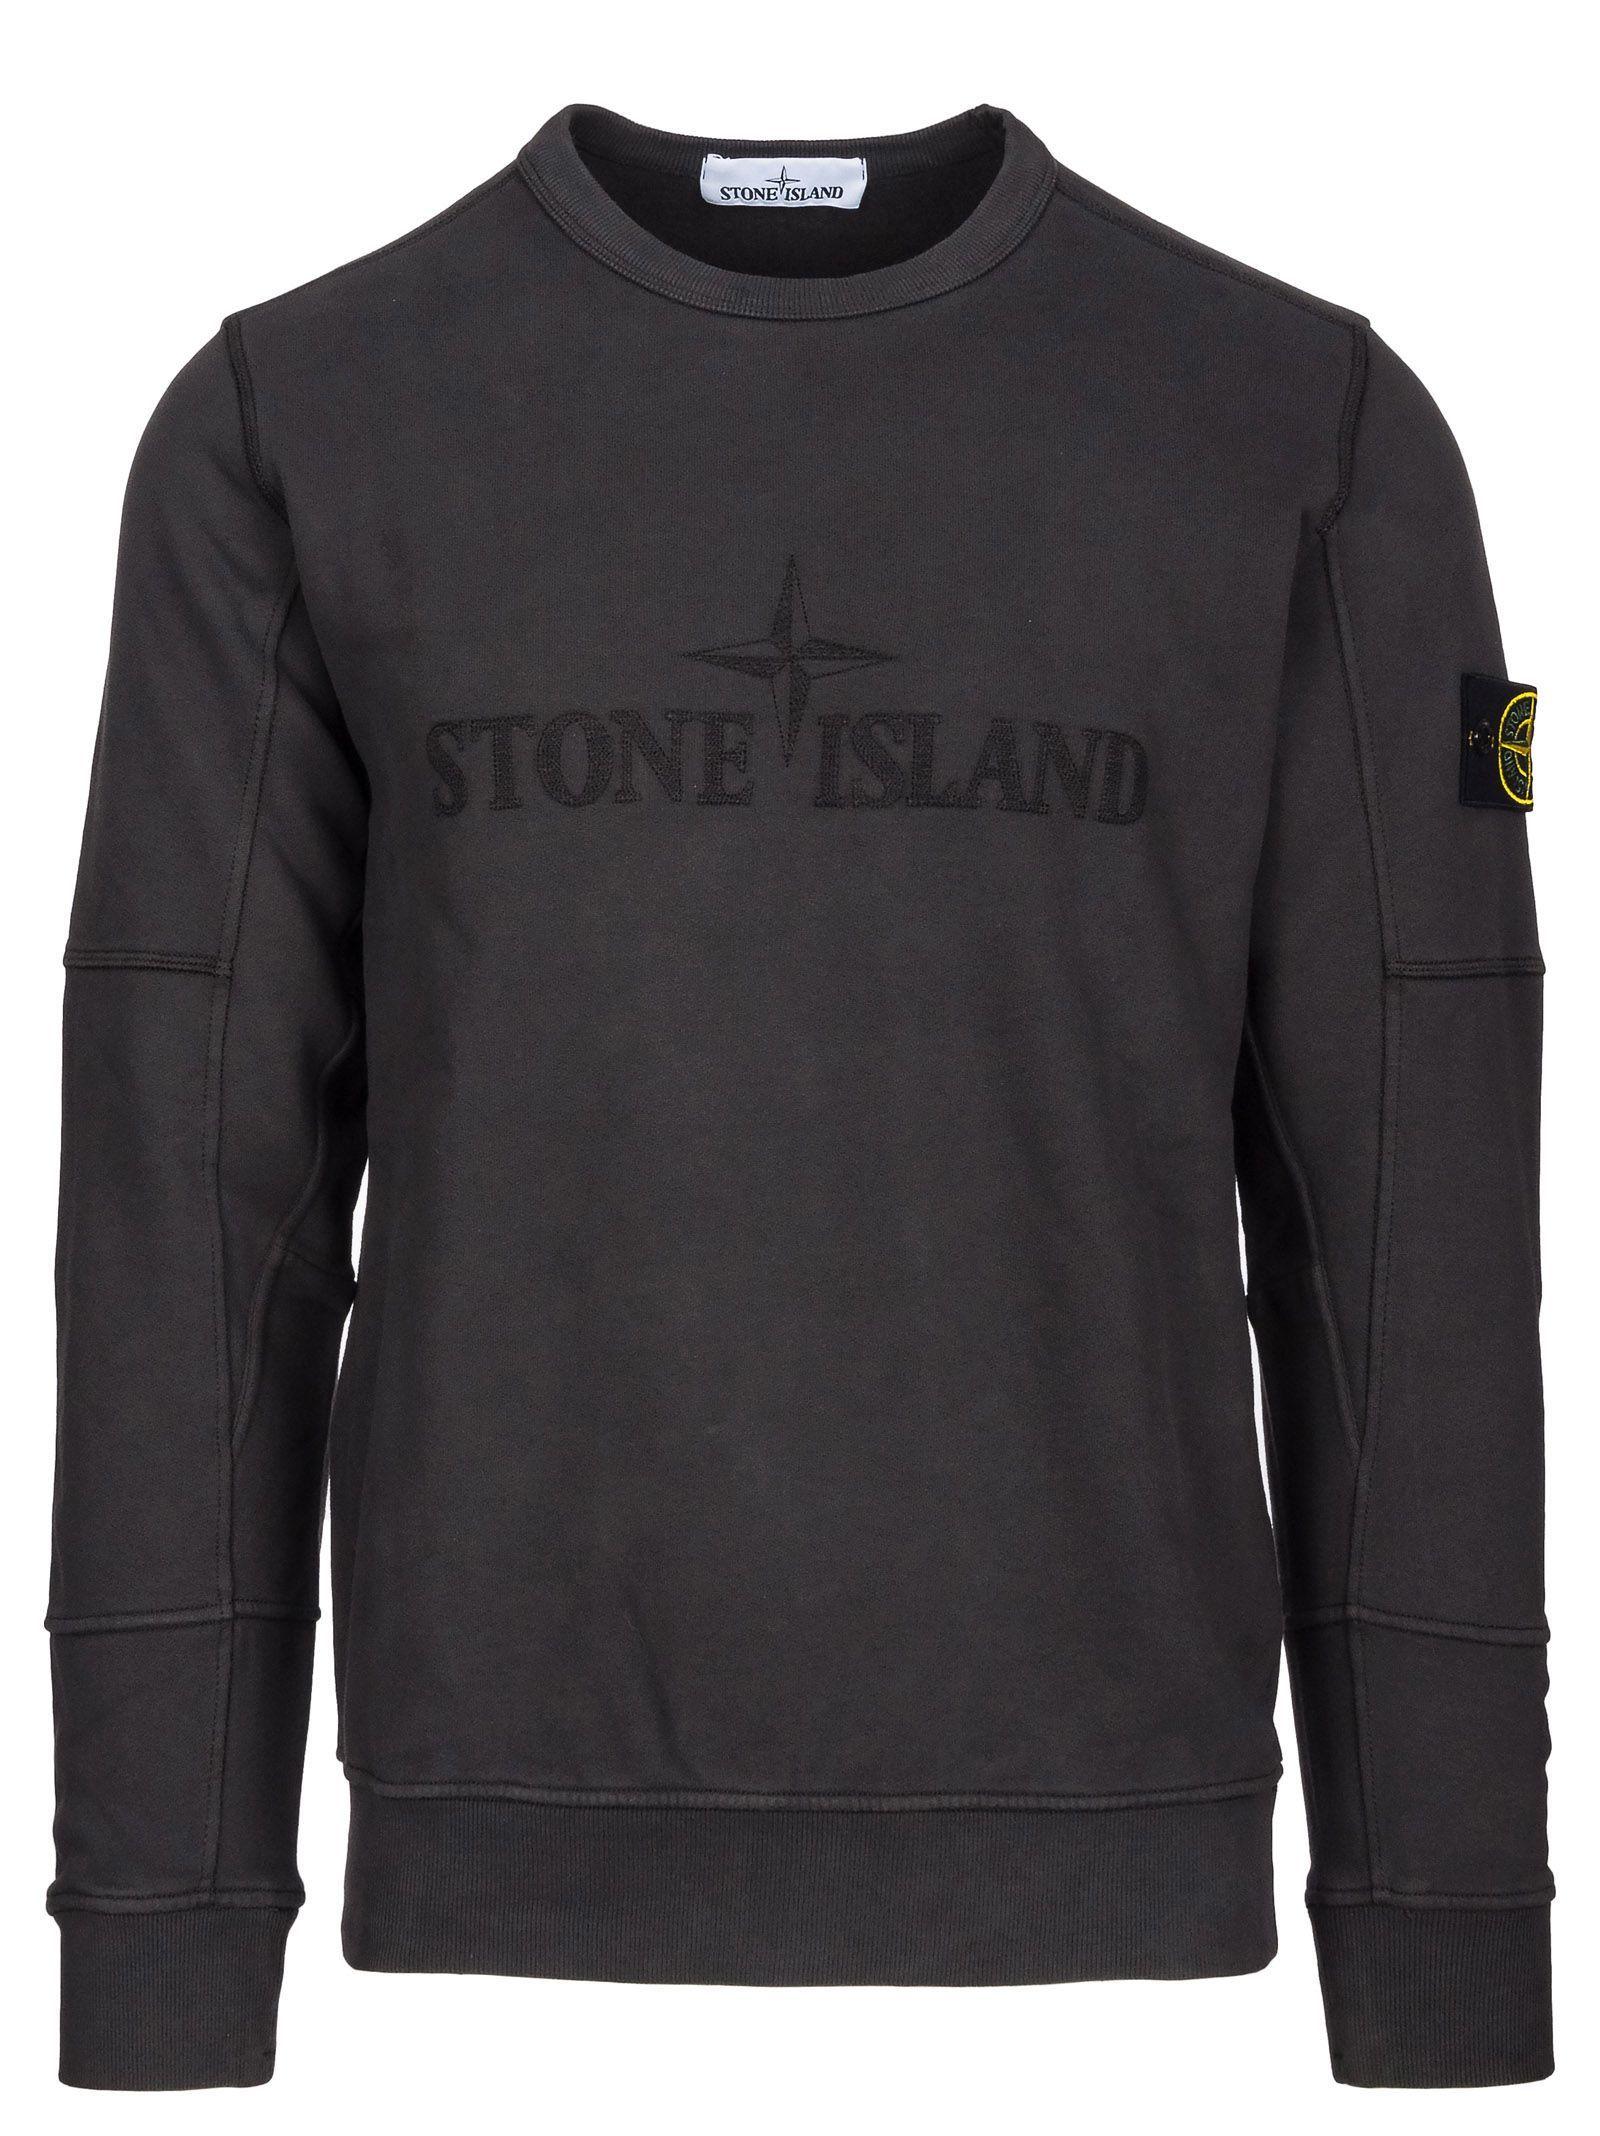 Crew Neck Sweatshirt In Grigio Scuro Stone Island Clothing Stone Island Crew Neck Stone Island